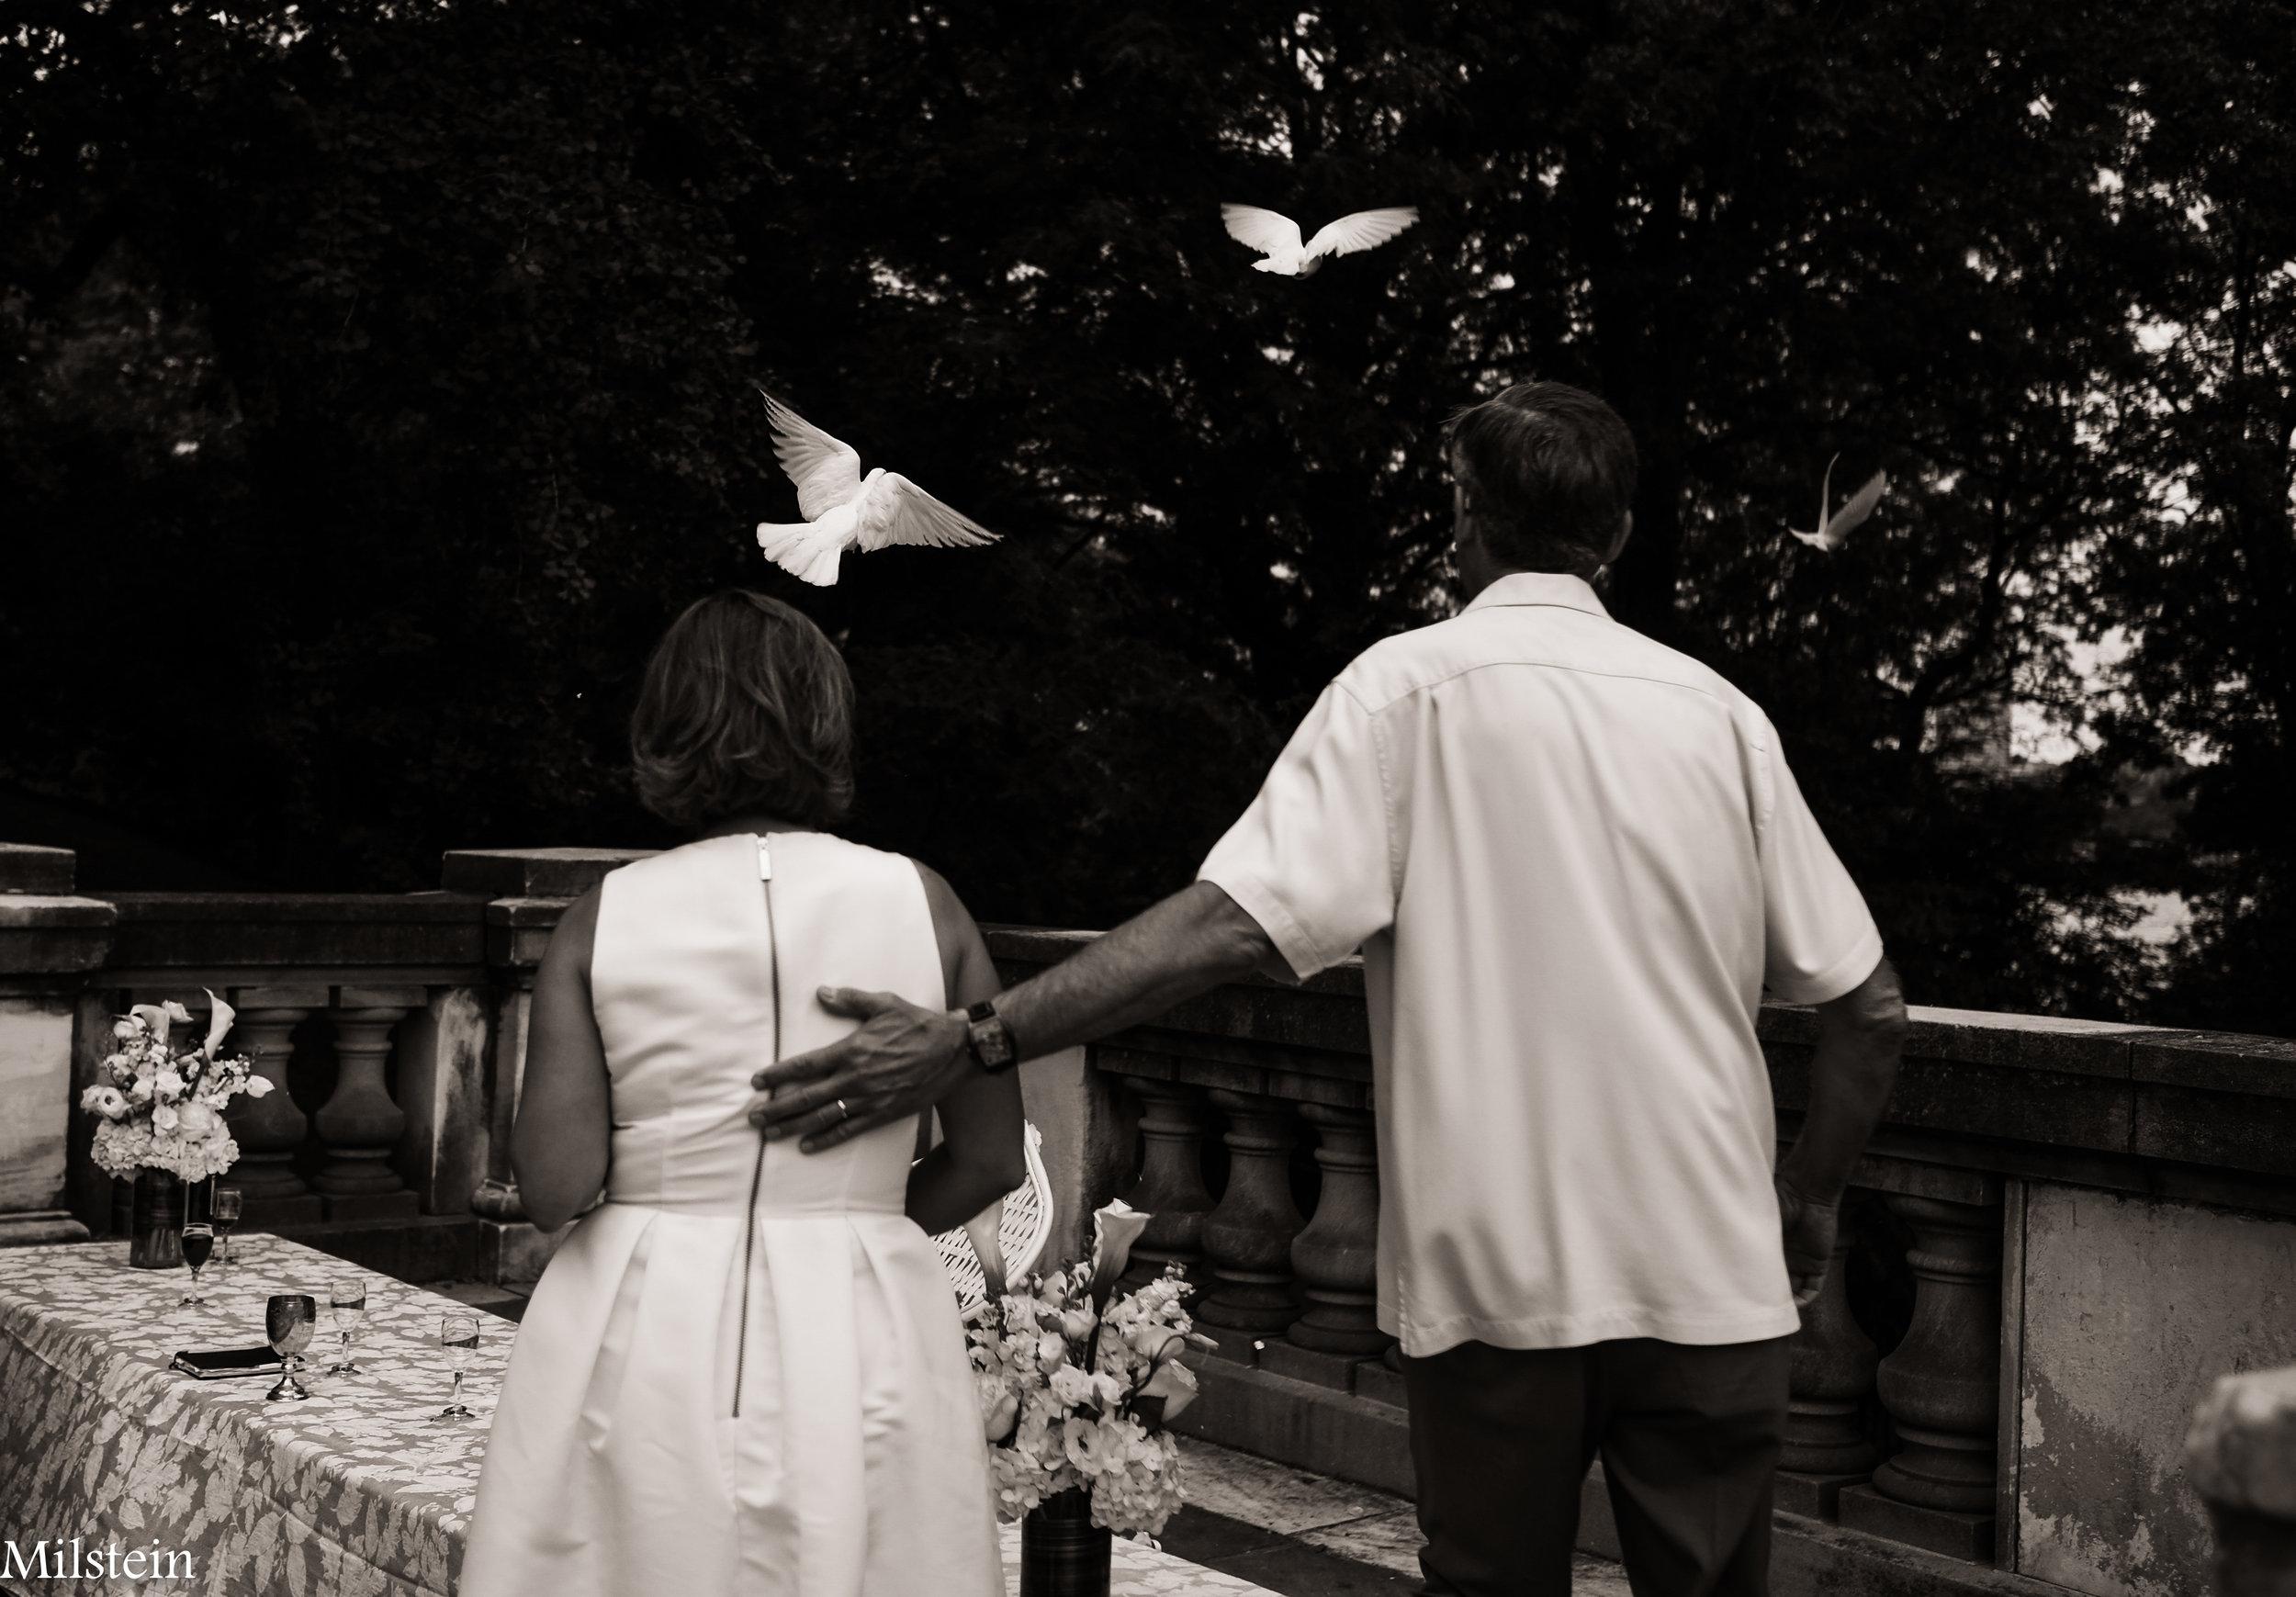 Wedding-Photographer-Amy-Milstein-Best-Wedding-Photographer.jpg